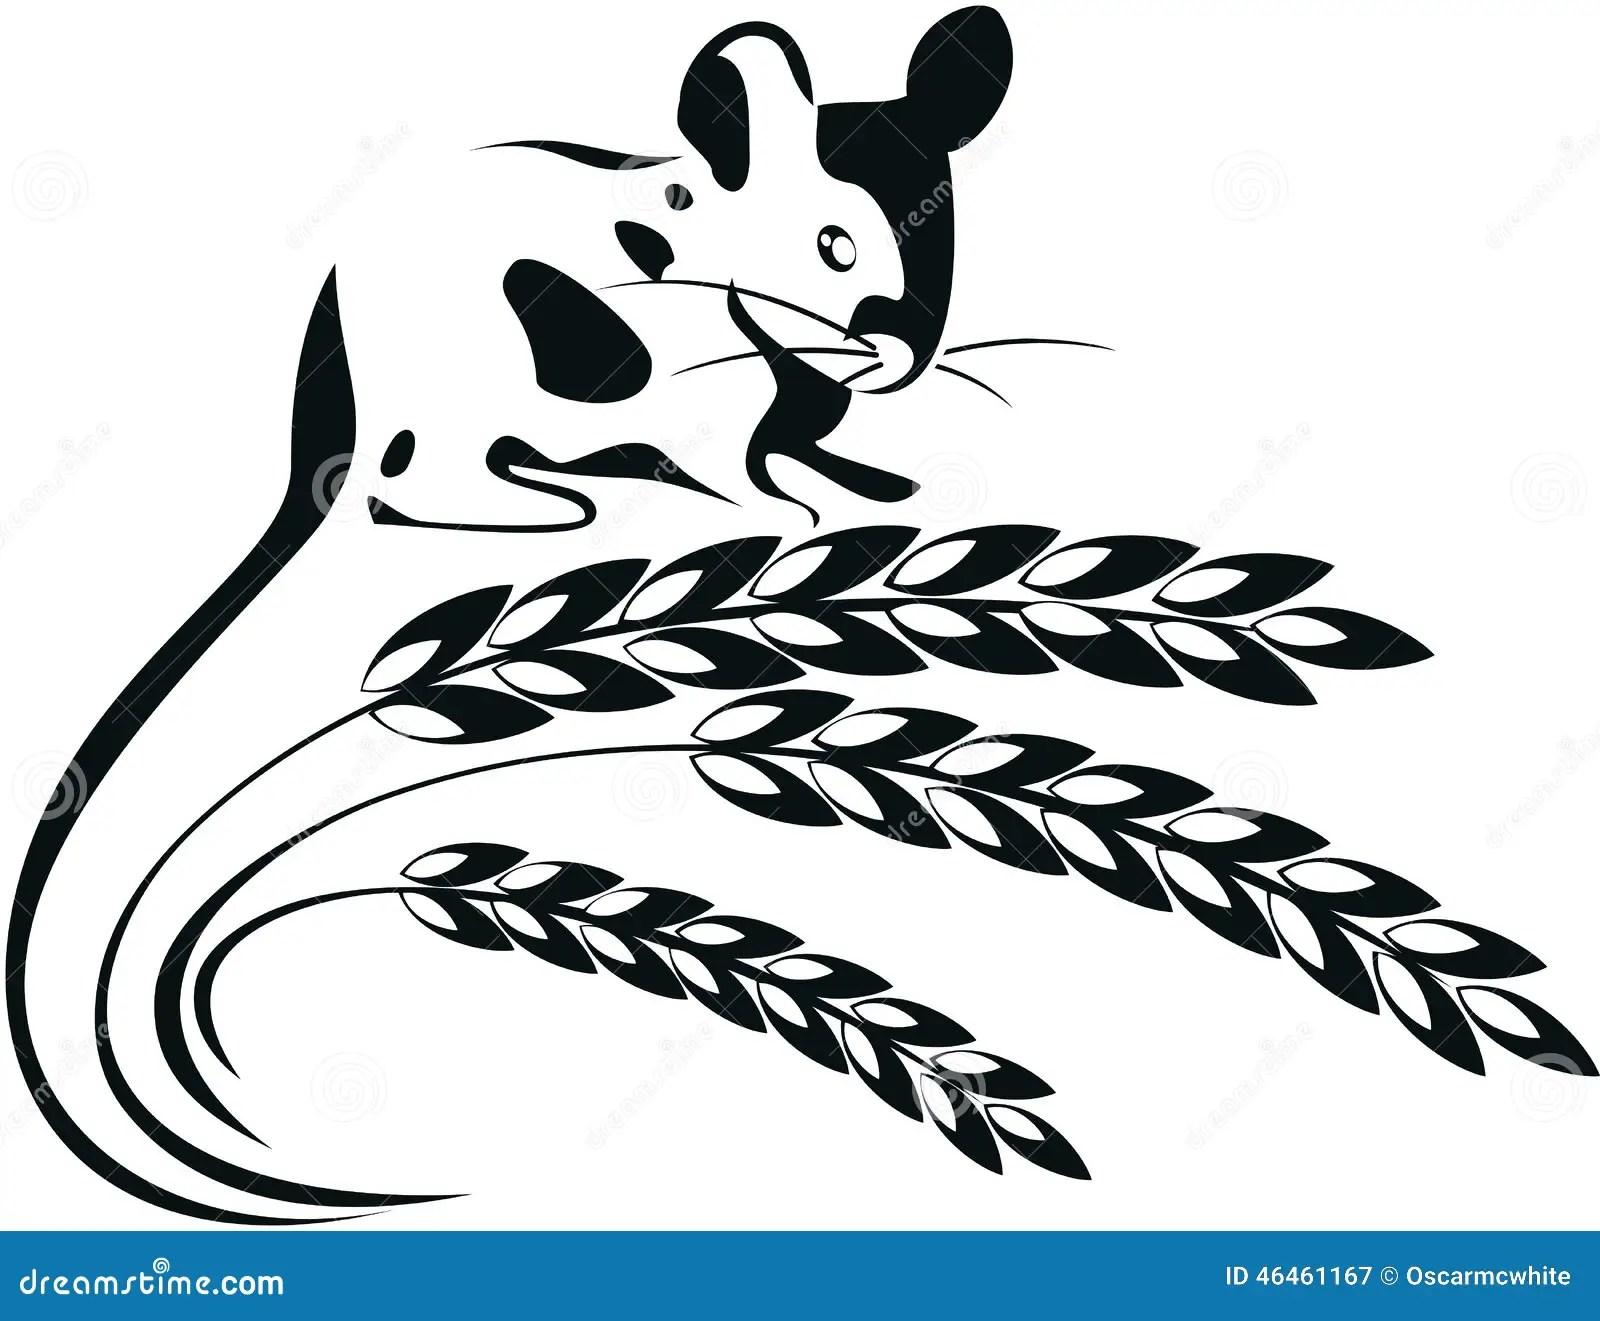 Bunch Of Wheat Grains Vector Vector Illustration